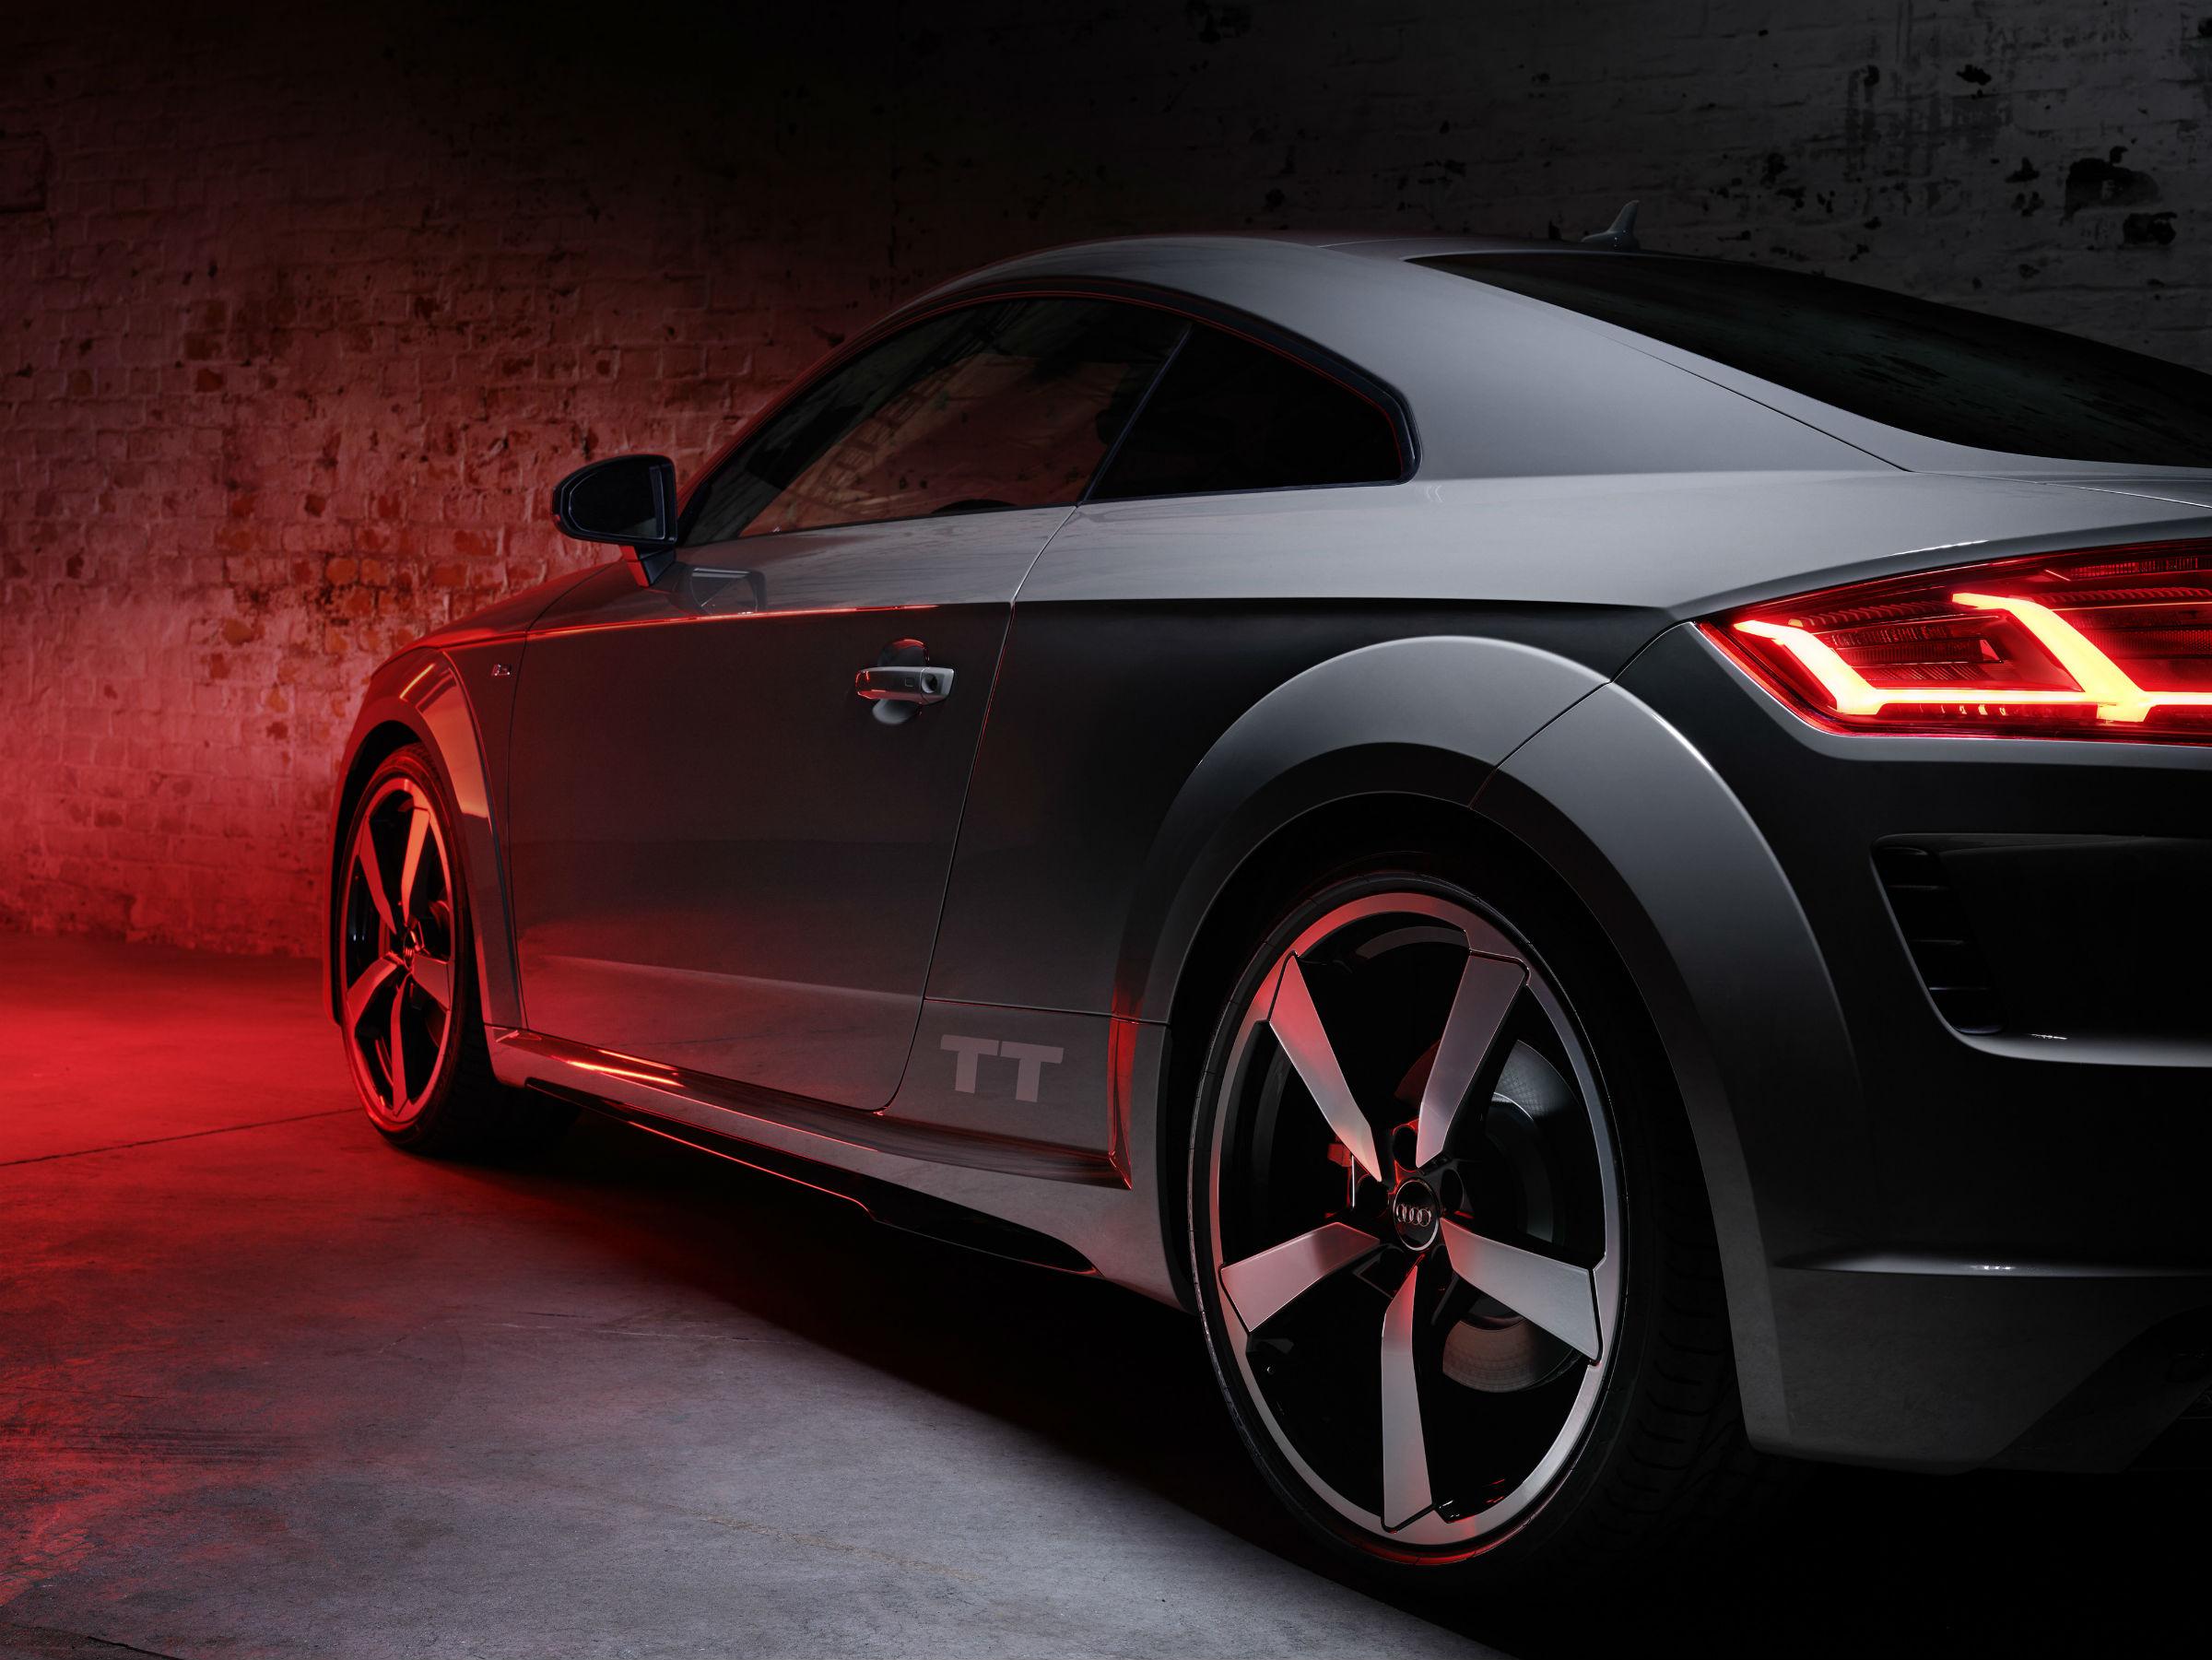 Audi TT seria limitowana